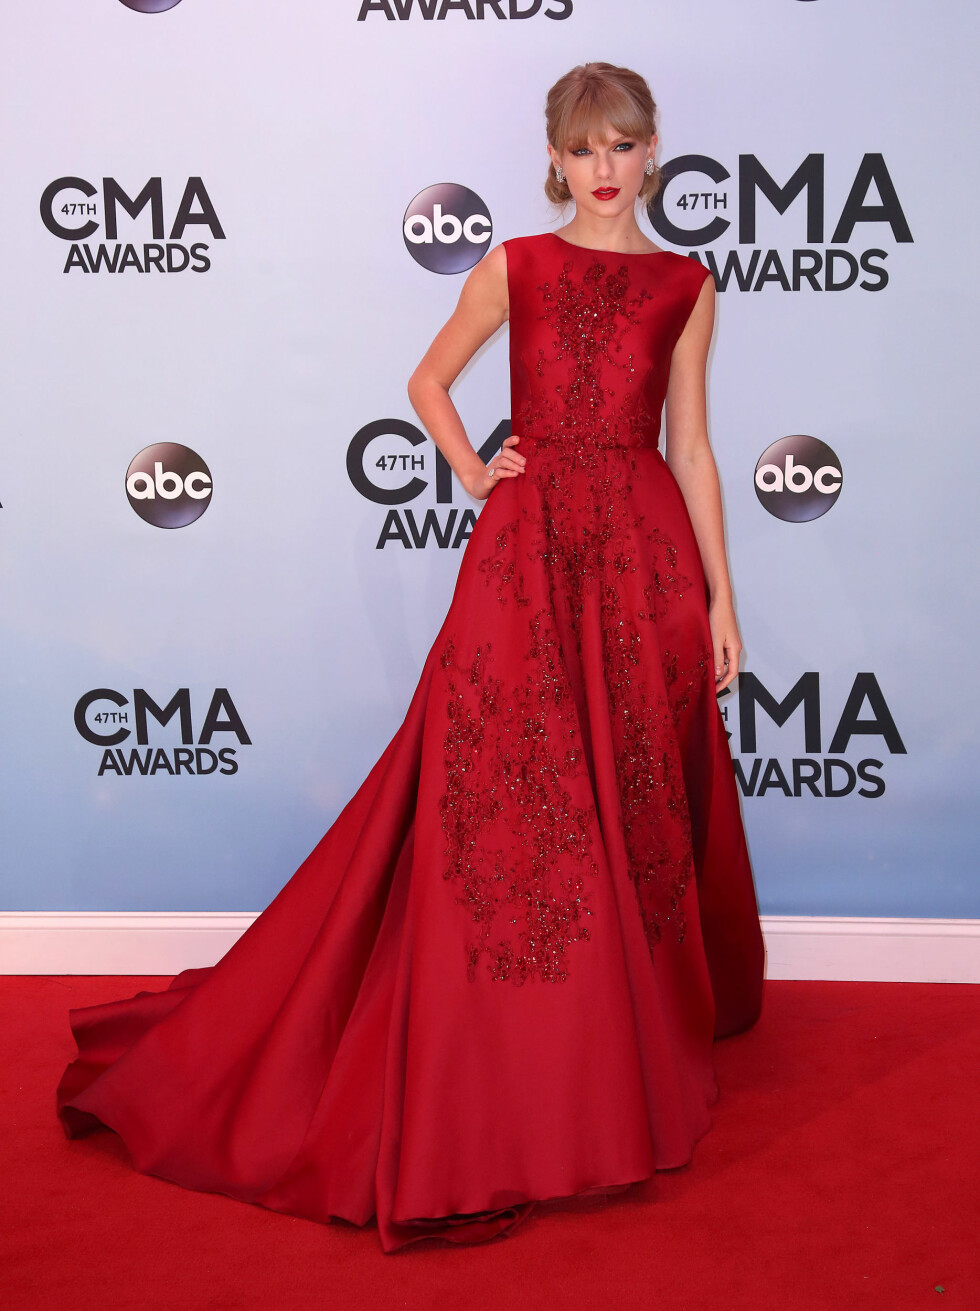 47th Annual CMA Awards - Nashville- Arrivals. Taylor Swift attends the 47th Annual CMA Awards held at the Bridgestone Arena, Nashville URN:18124459 Foto: Pa Photos